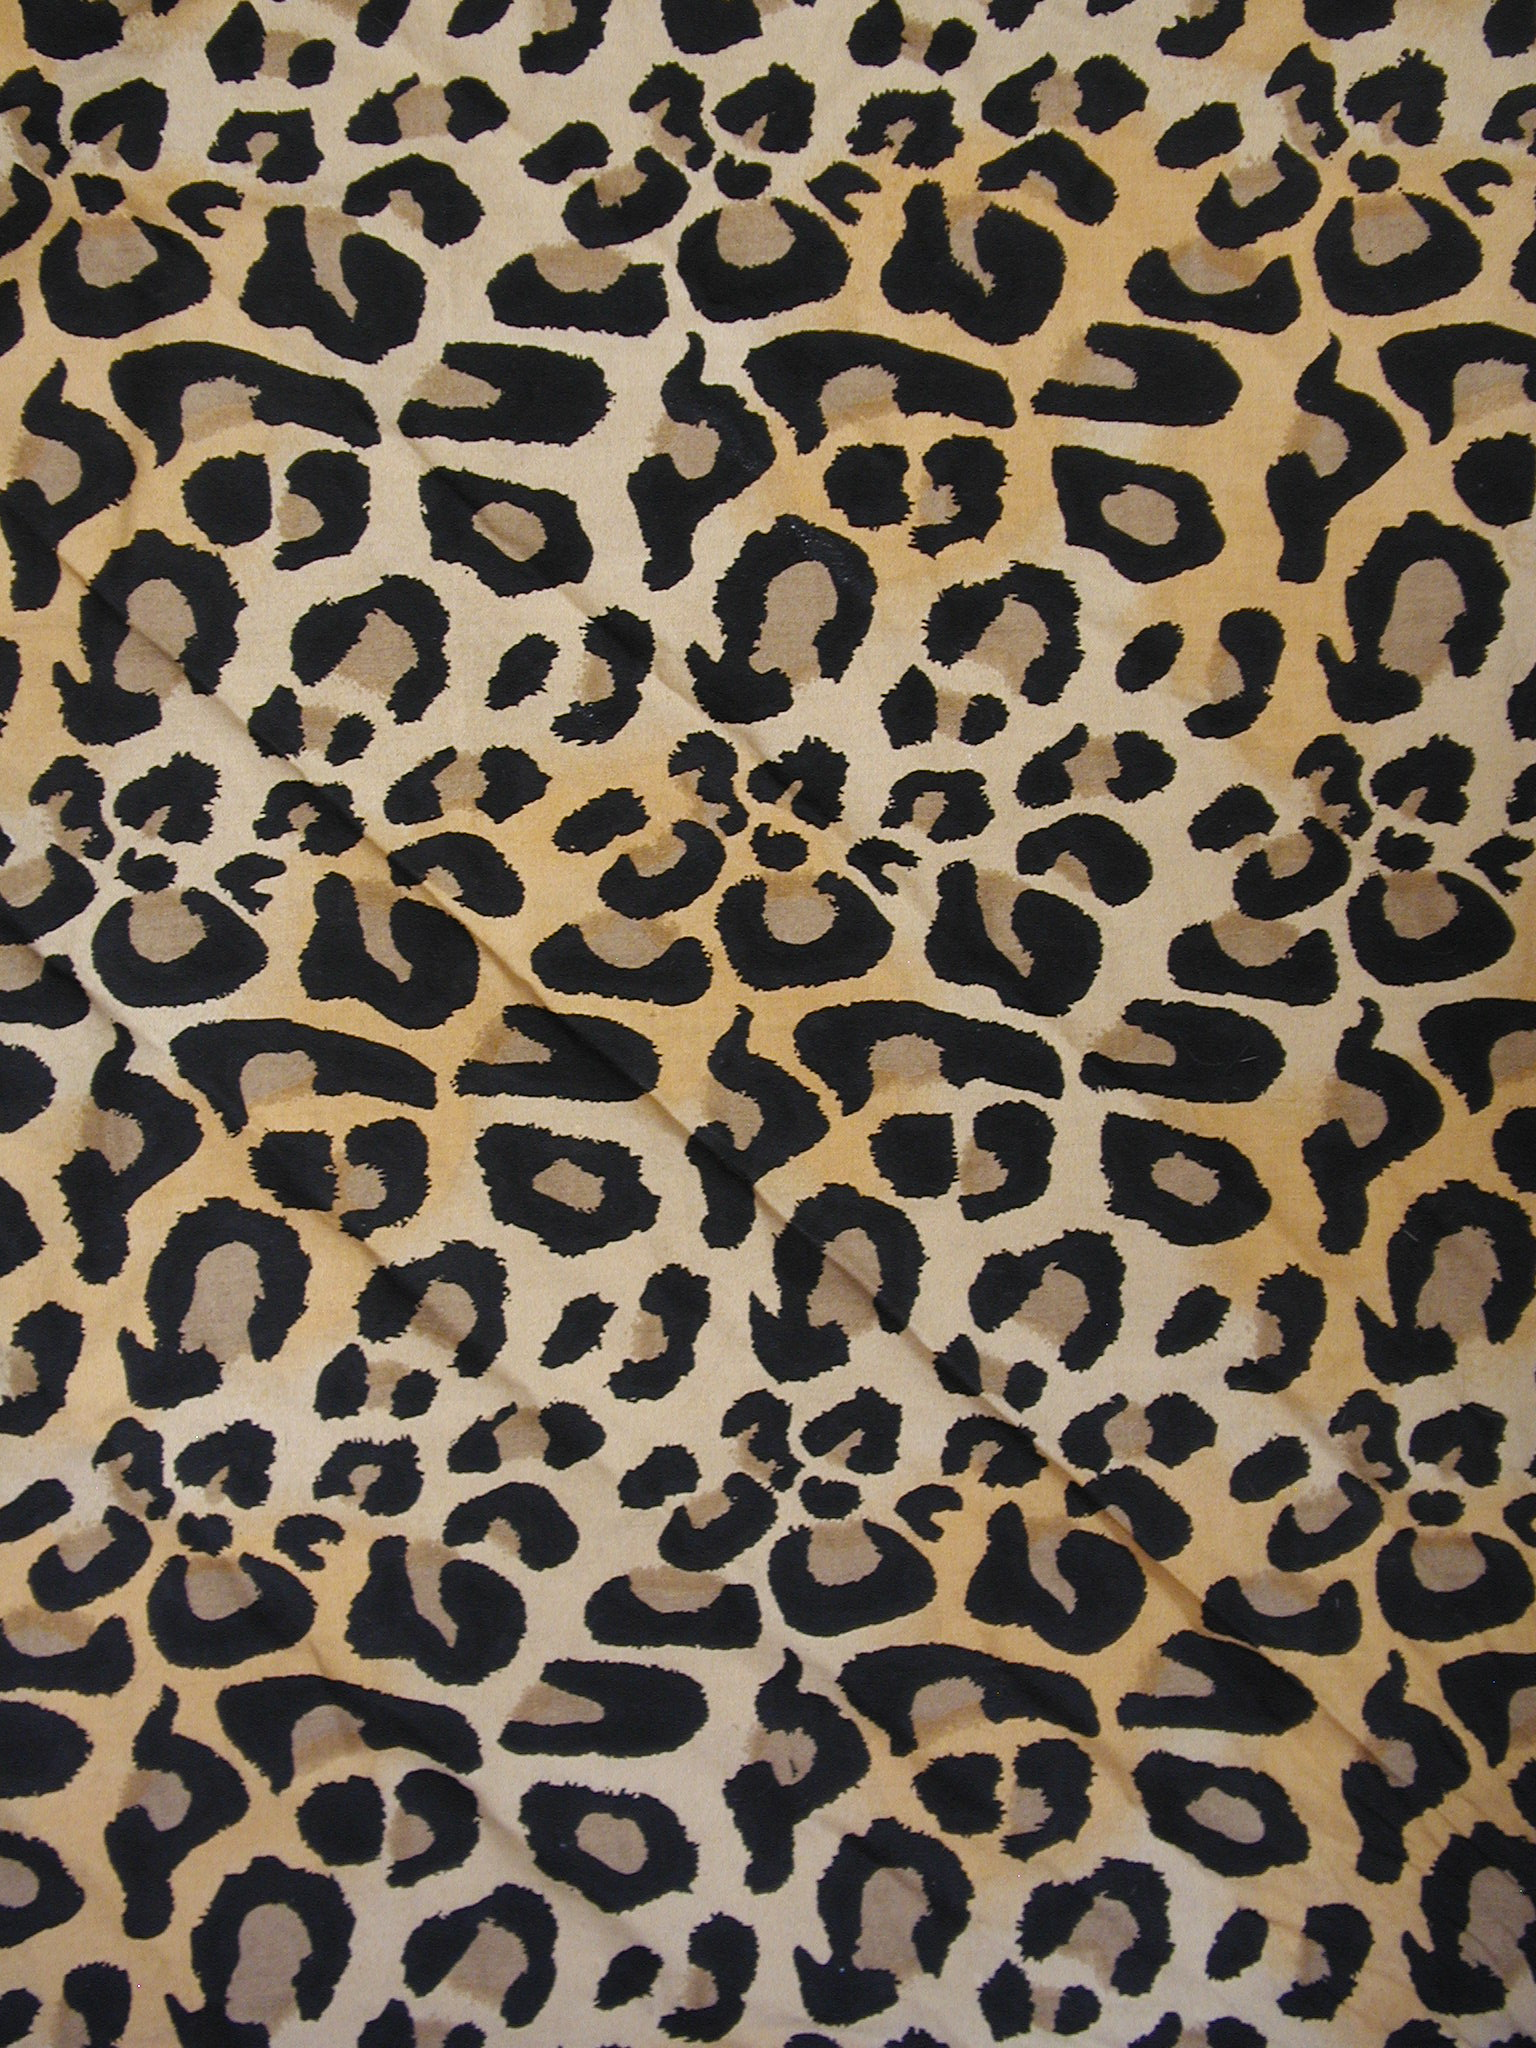 Best animal wallpapers leopard print wallpaper for Printed wallpaper